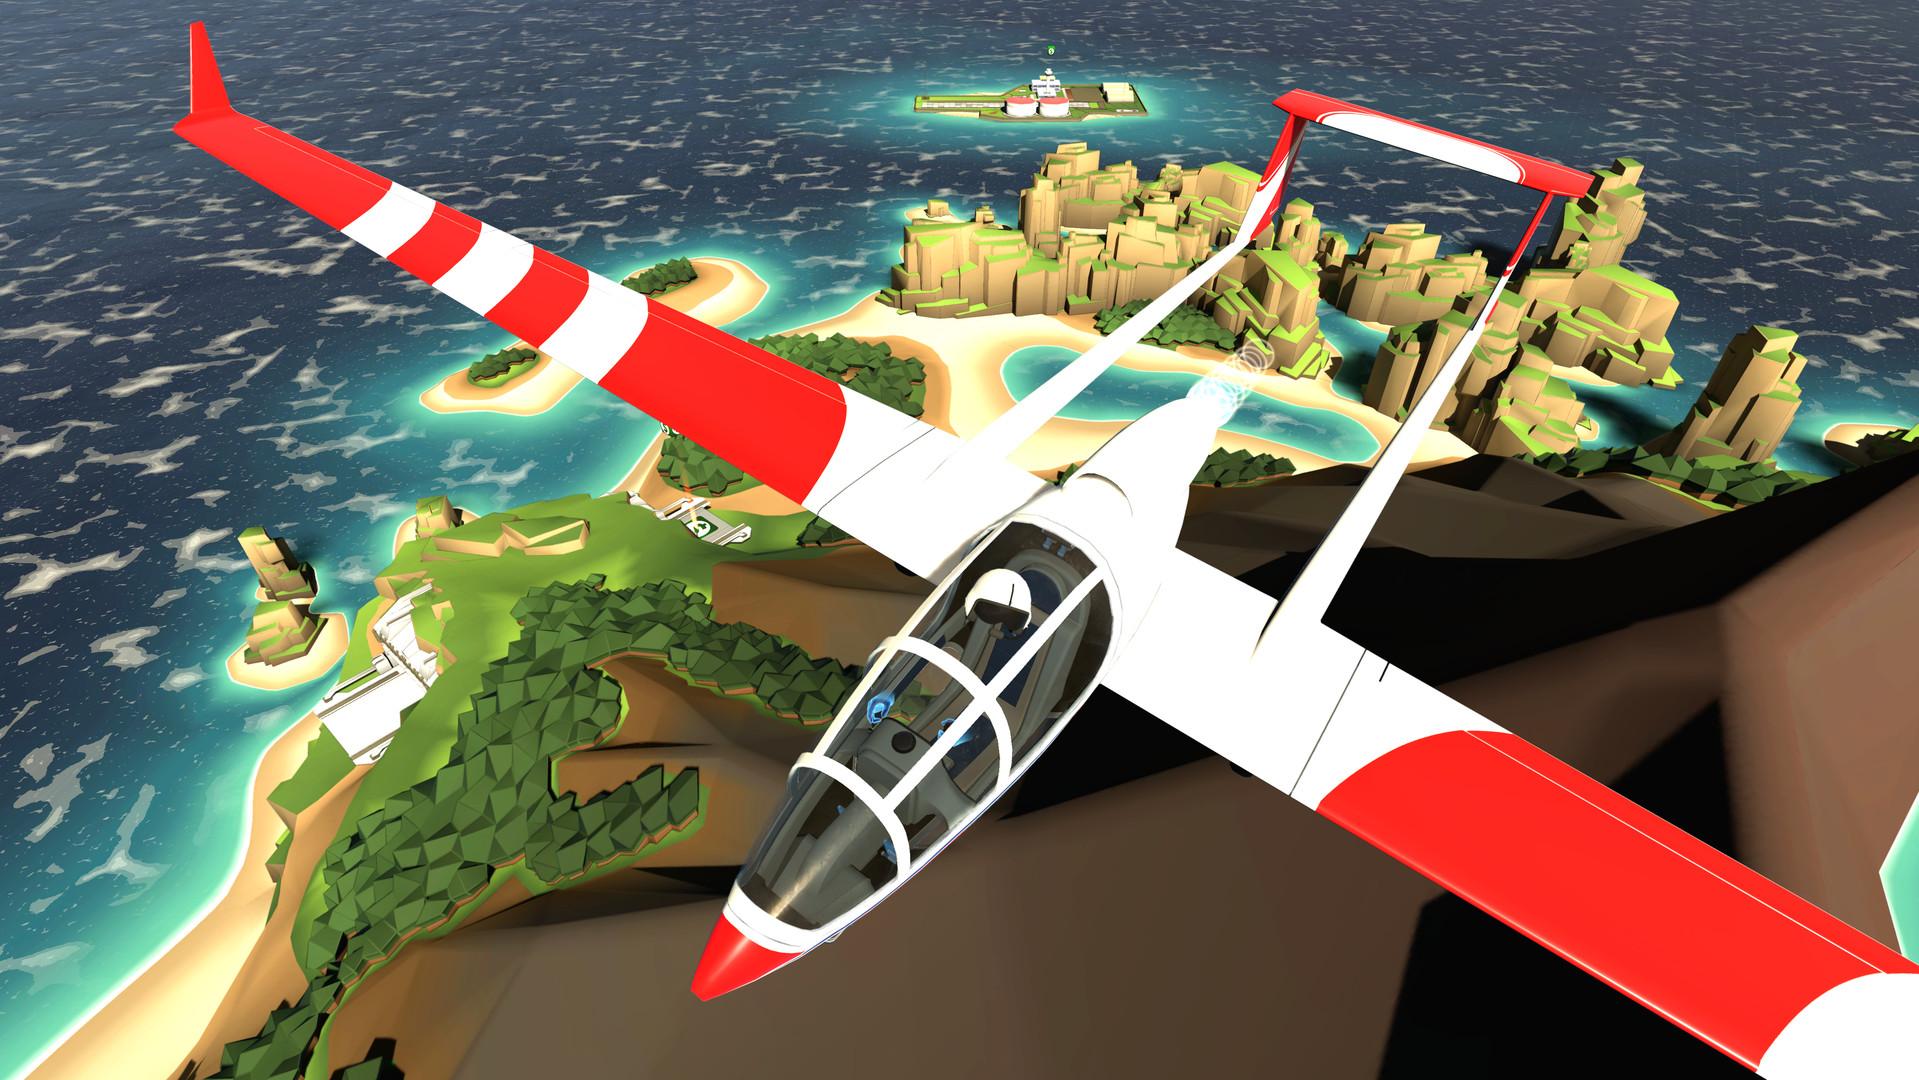 Oculus Quest 游戏《Ultrawings》模拟飞行插图(1)